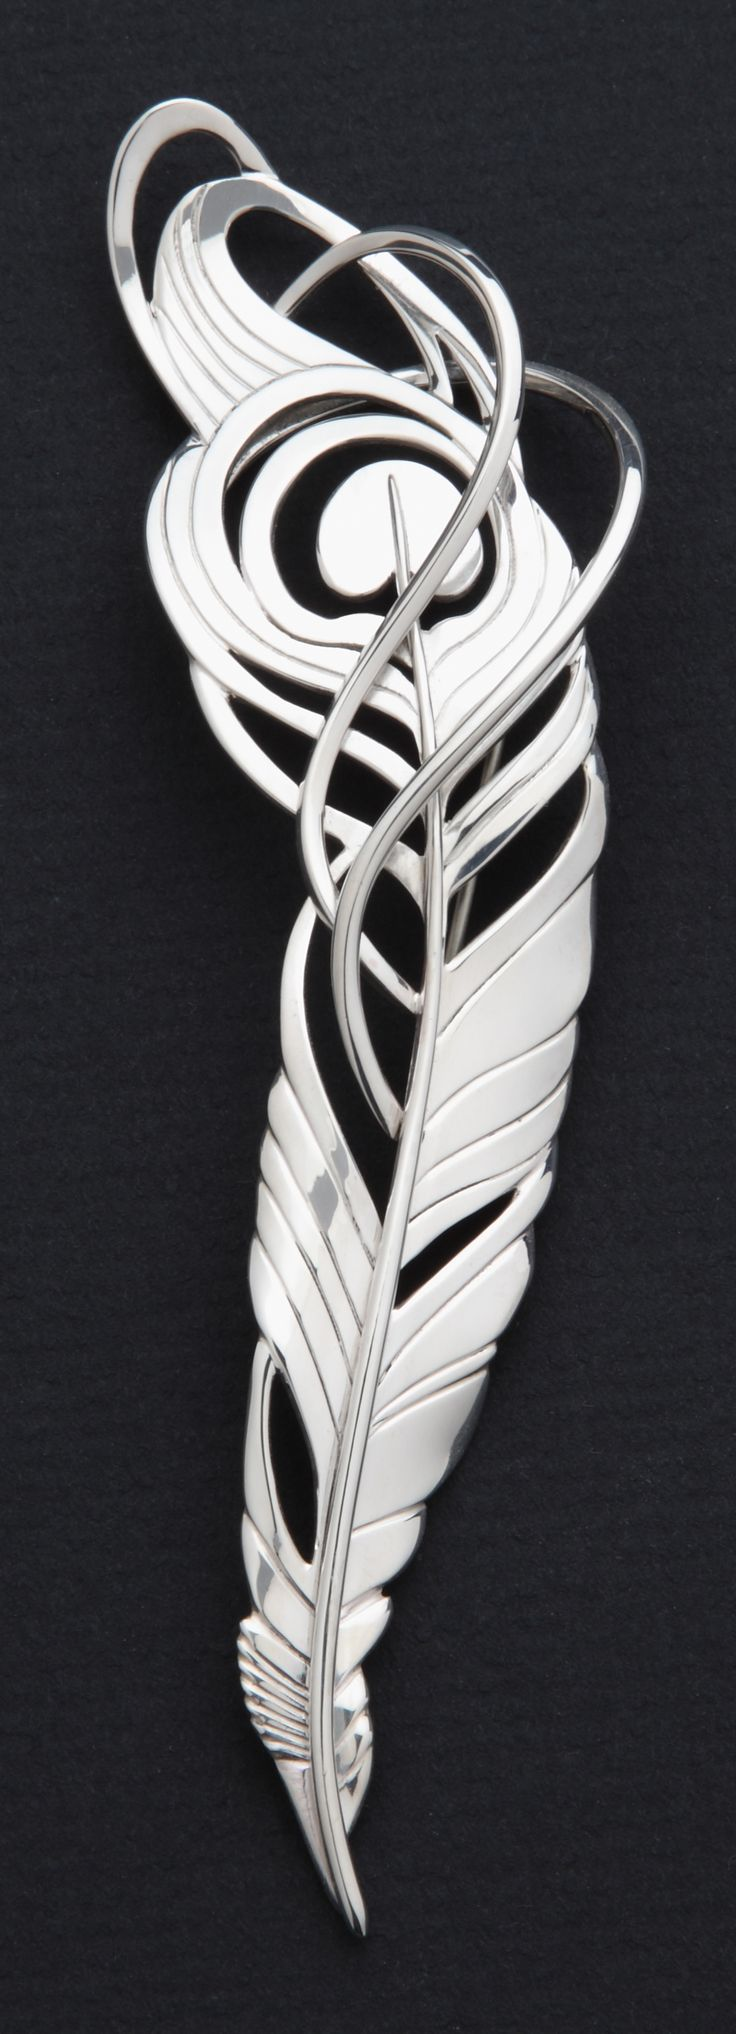 Sterling silver brooch. Copyright Robyn Nichols.